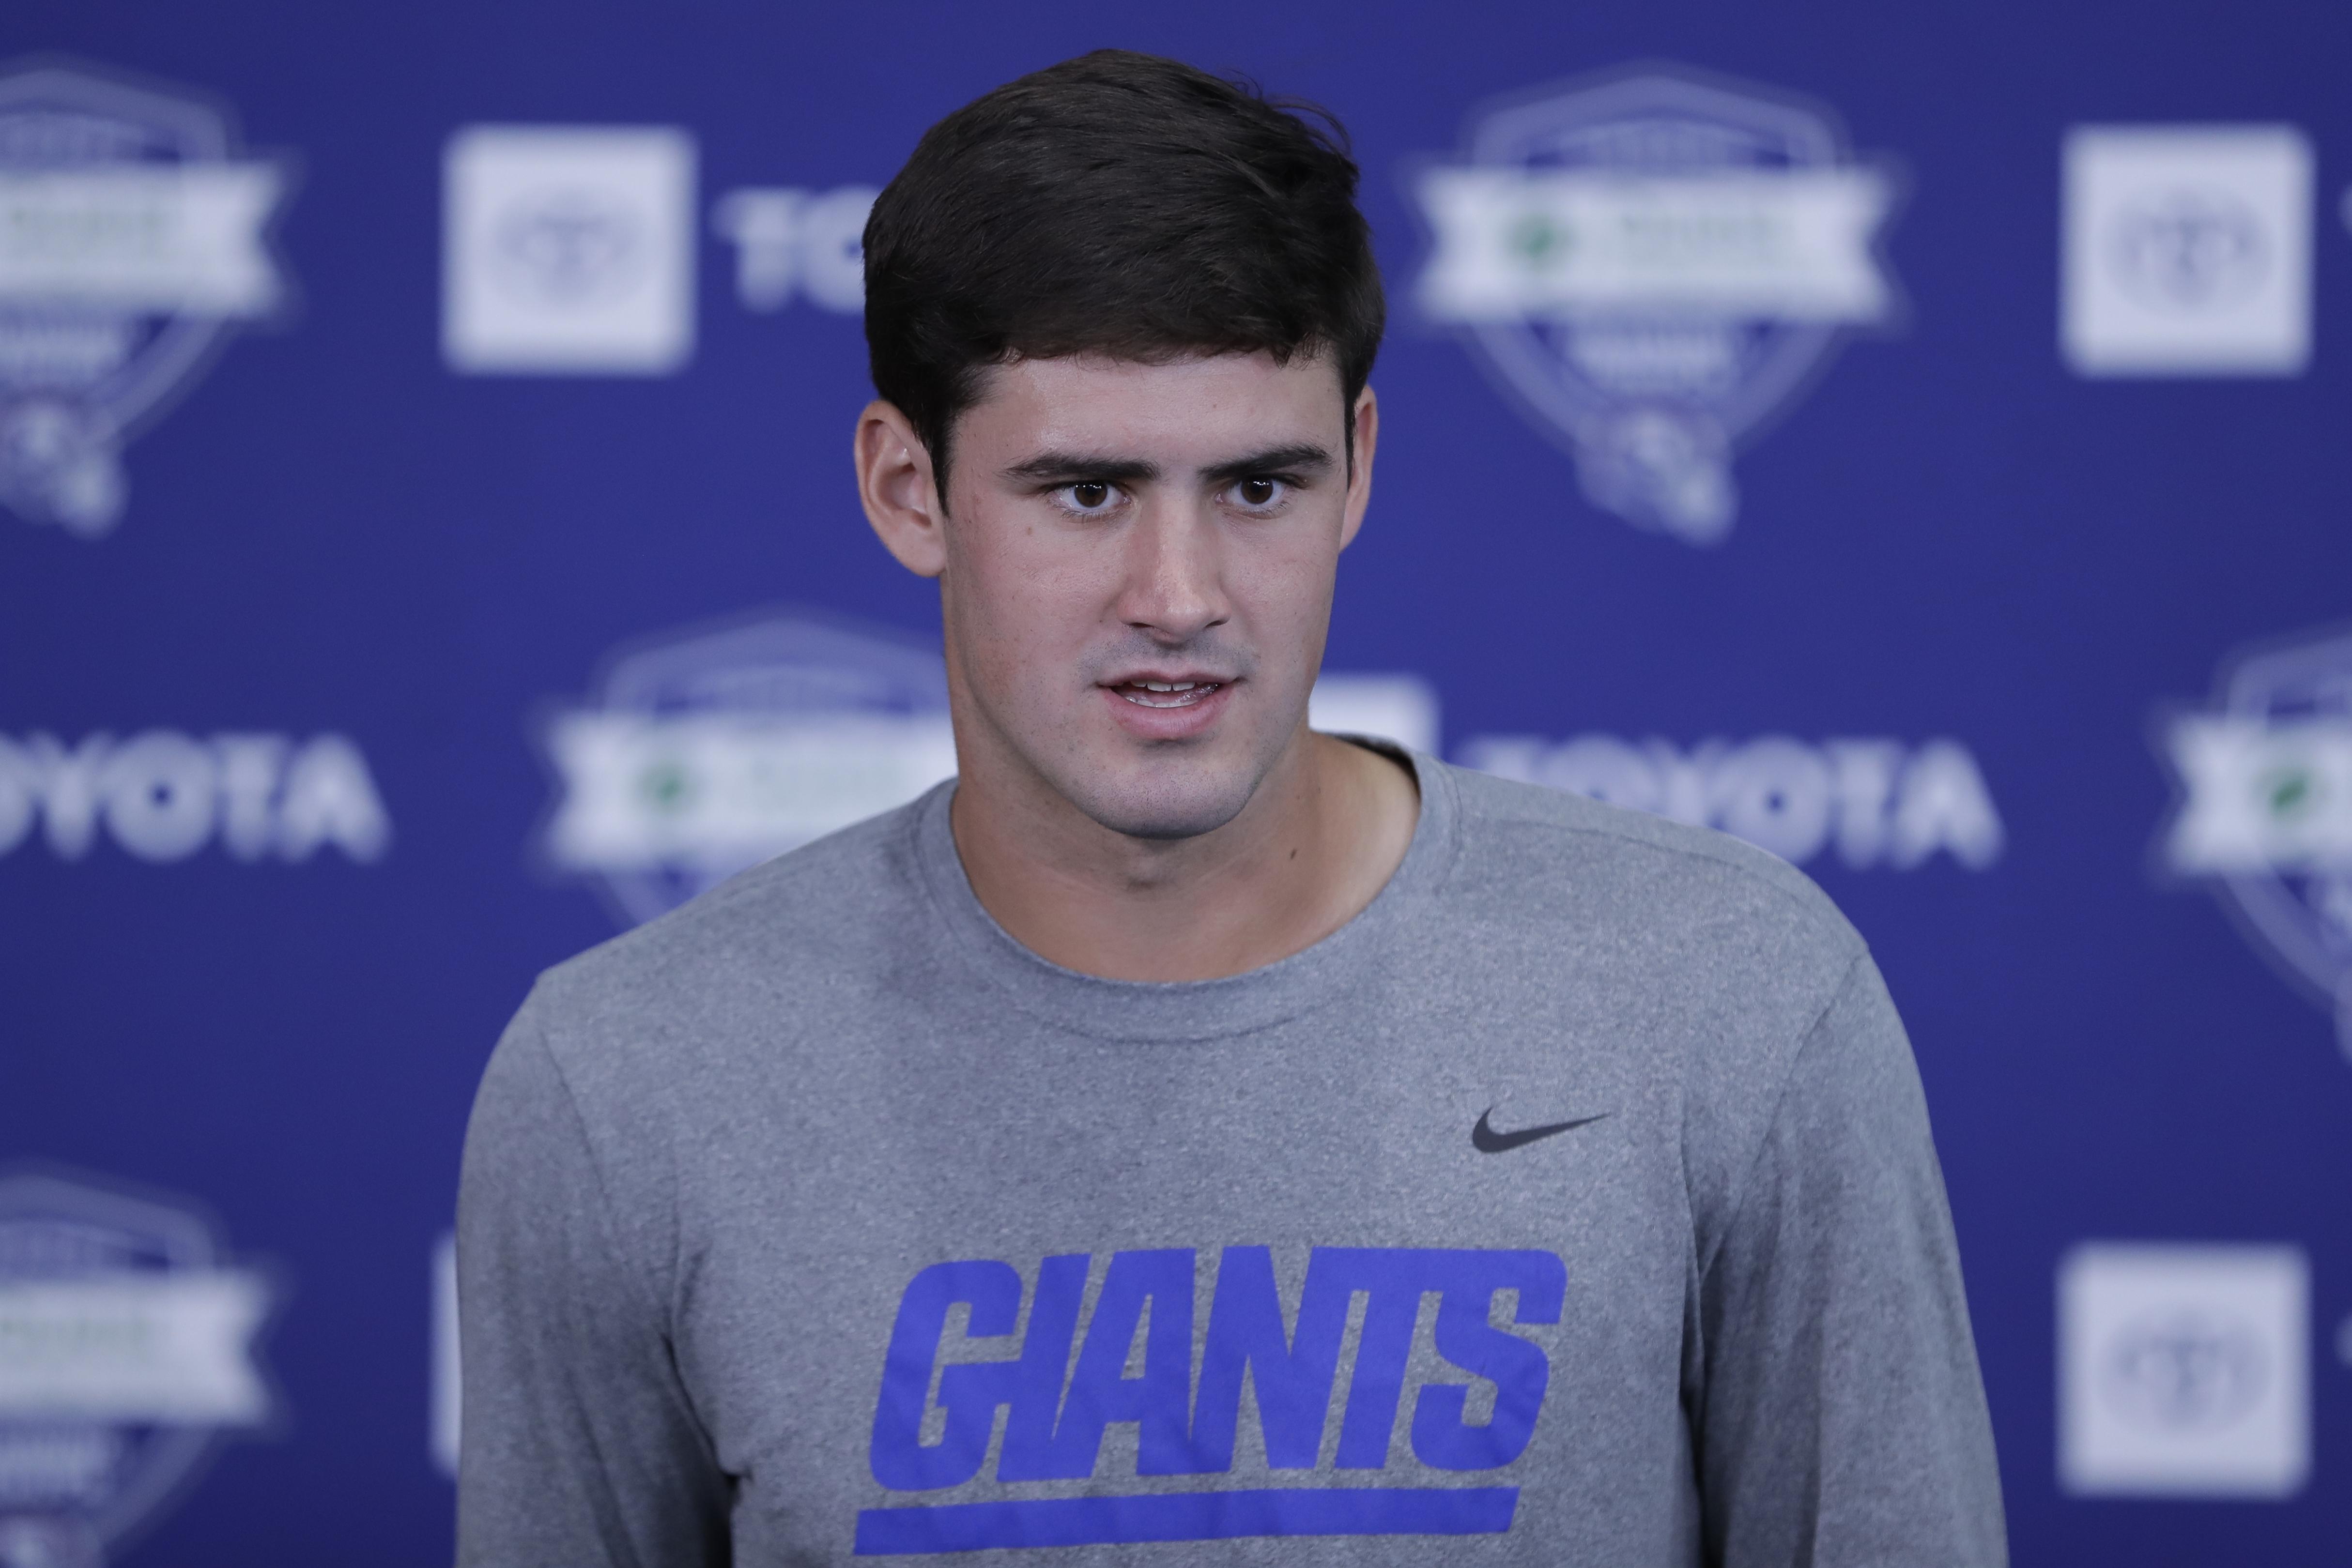 b3d0733f With Daniel Jones waiting, when do Giants sit Eli Manning? | SWX ...